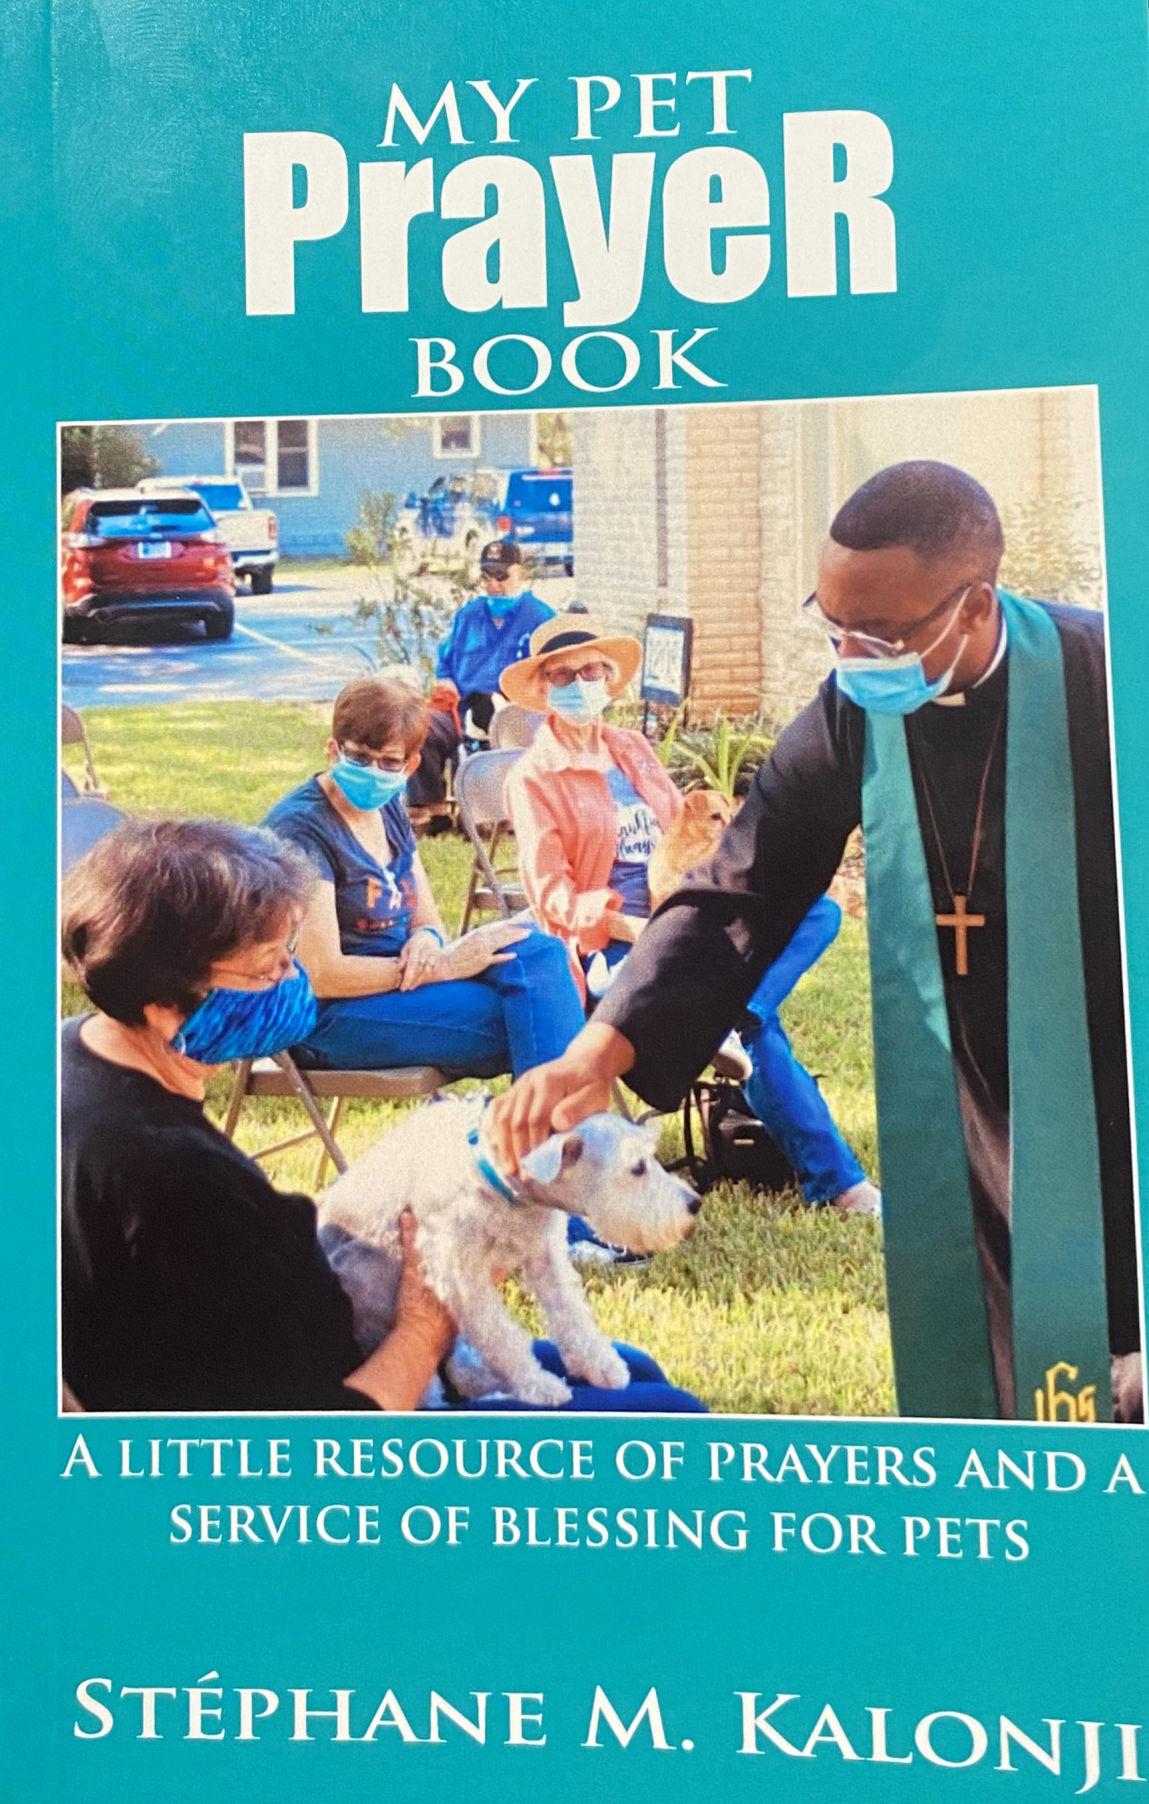 My Pet Prayer Book